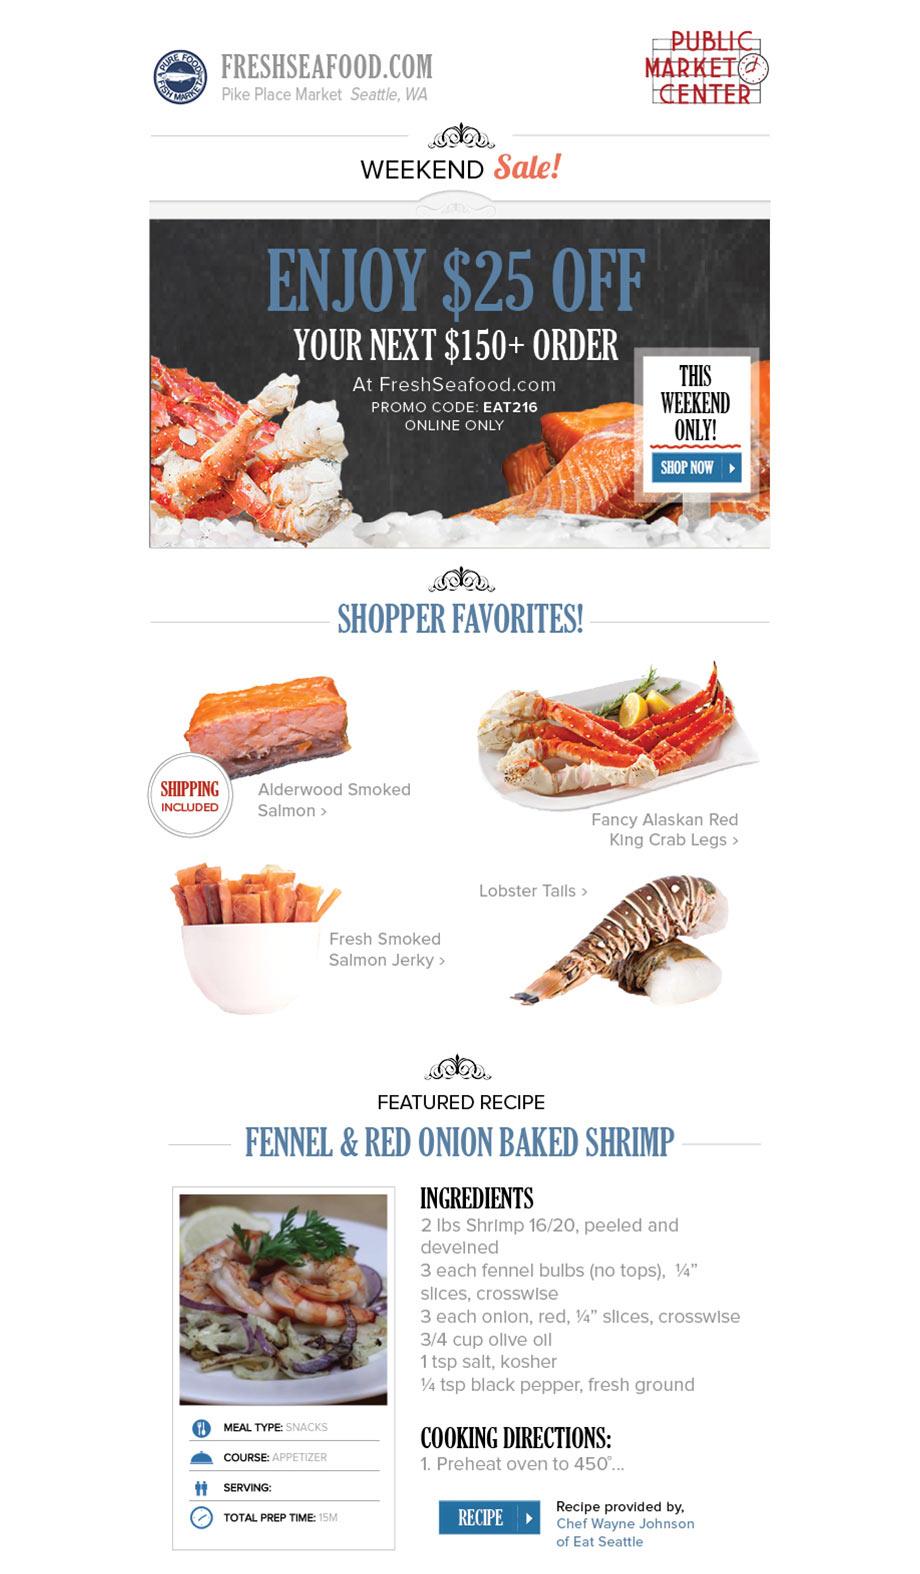 Pure food fish market email design vicki grunewald for Pure food fish market